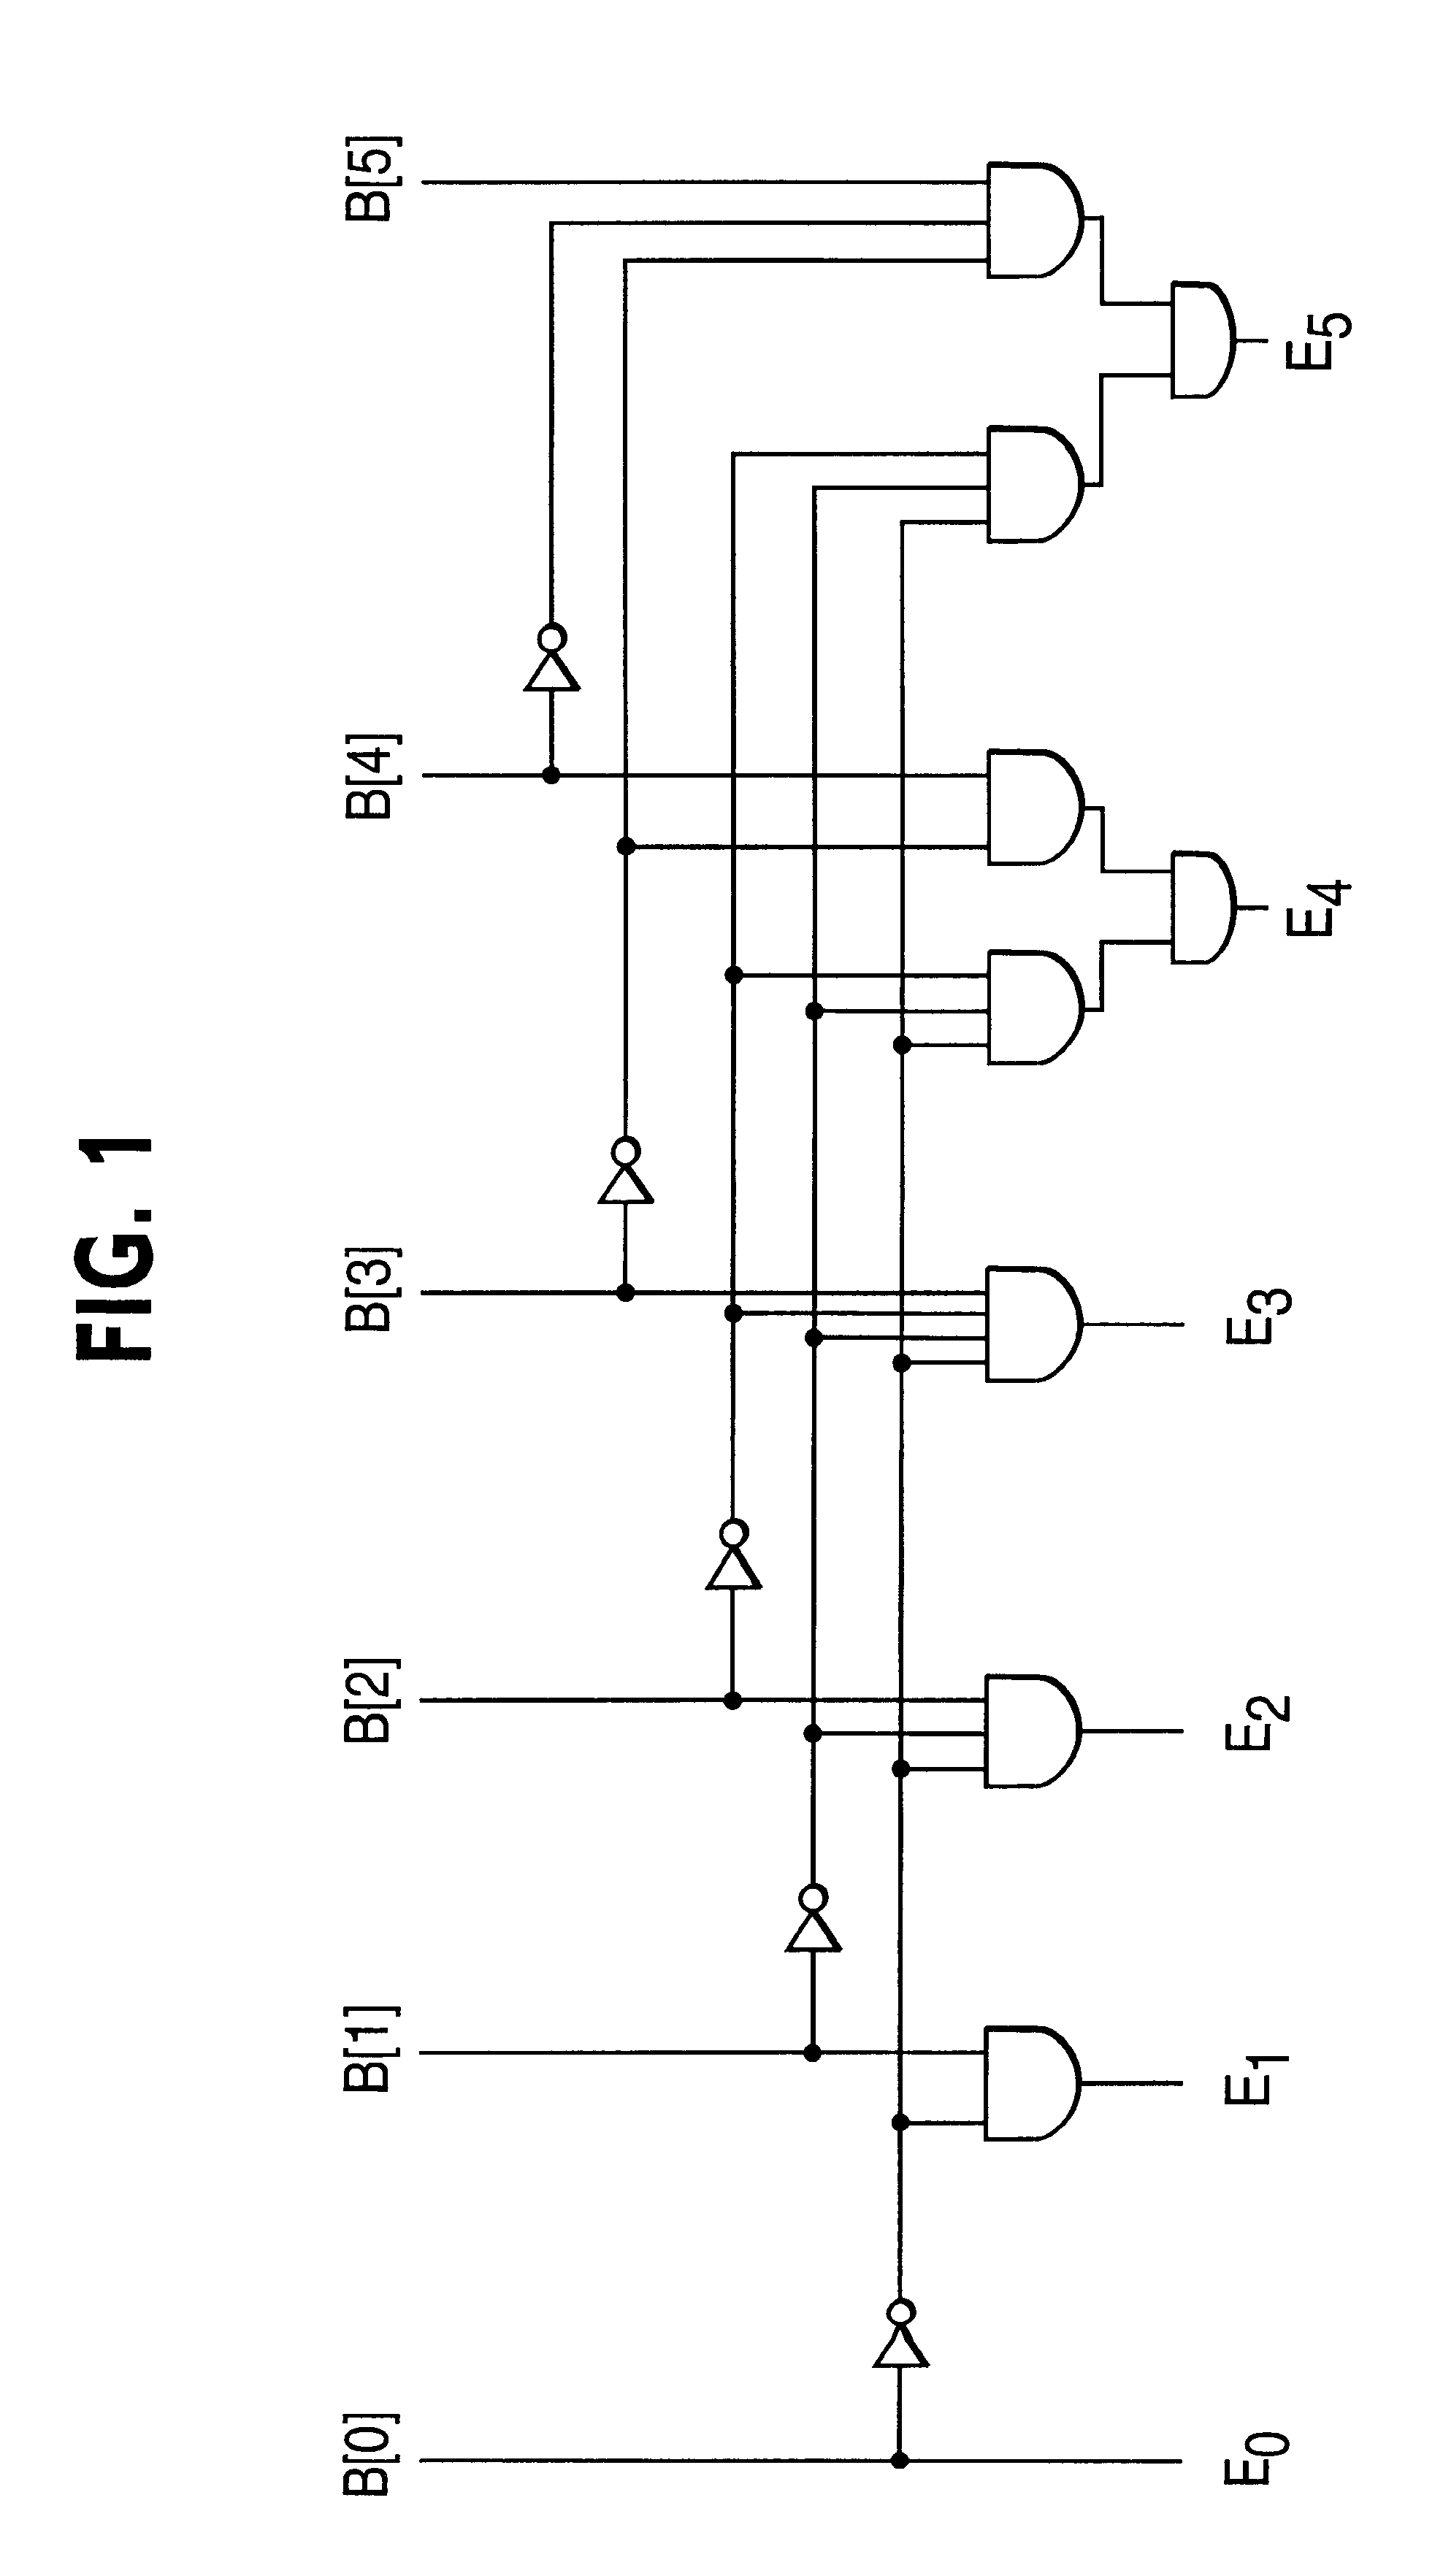 Patent Us6696988 Method And Apparatus For Implementing Circular Logic Diagram Of Priority Encoder Drawing